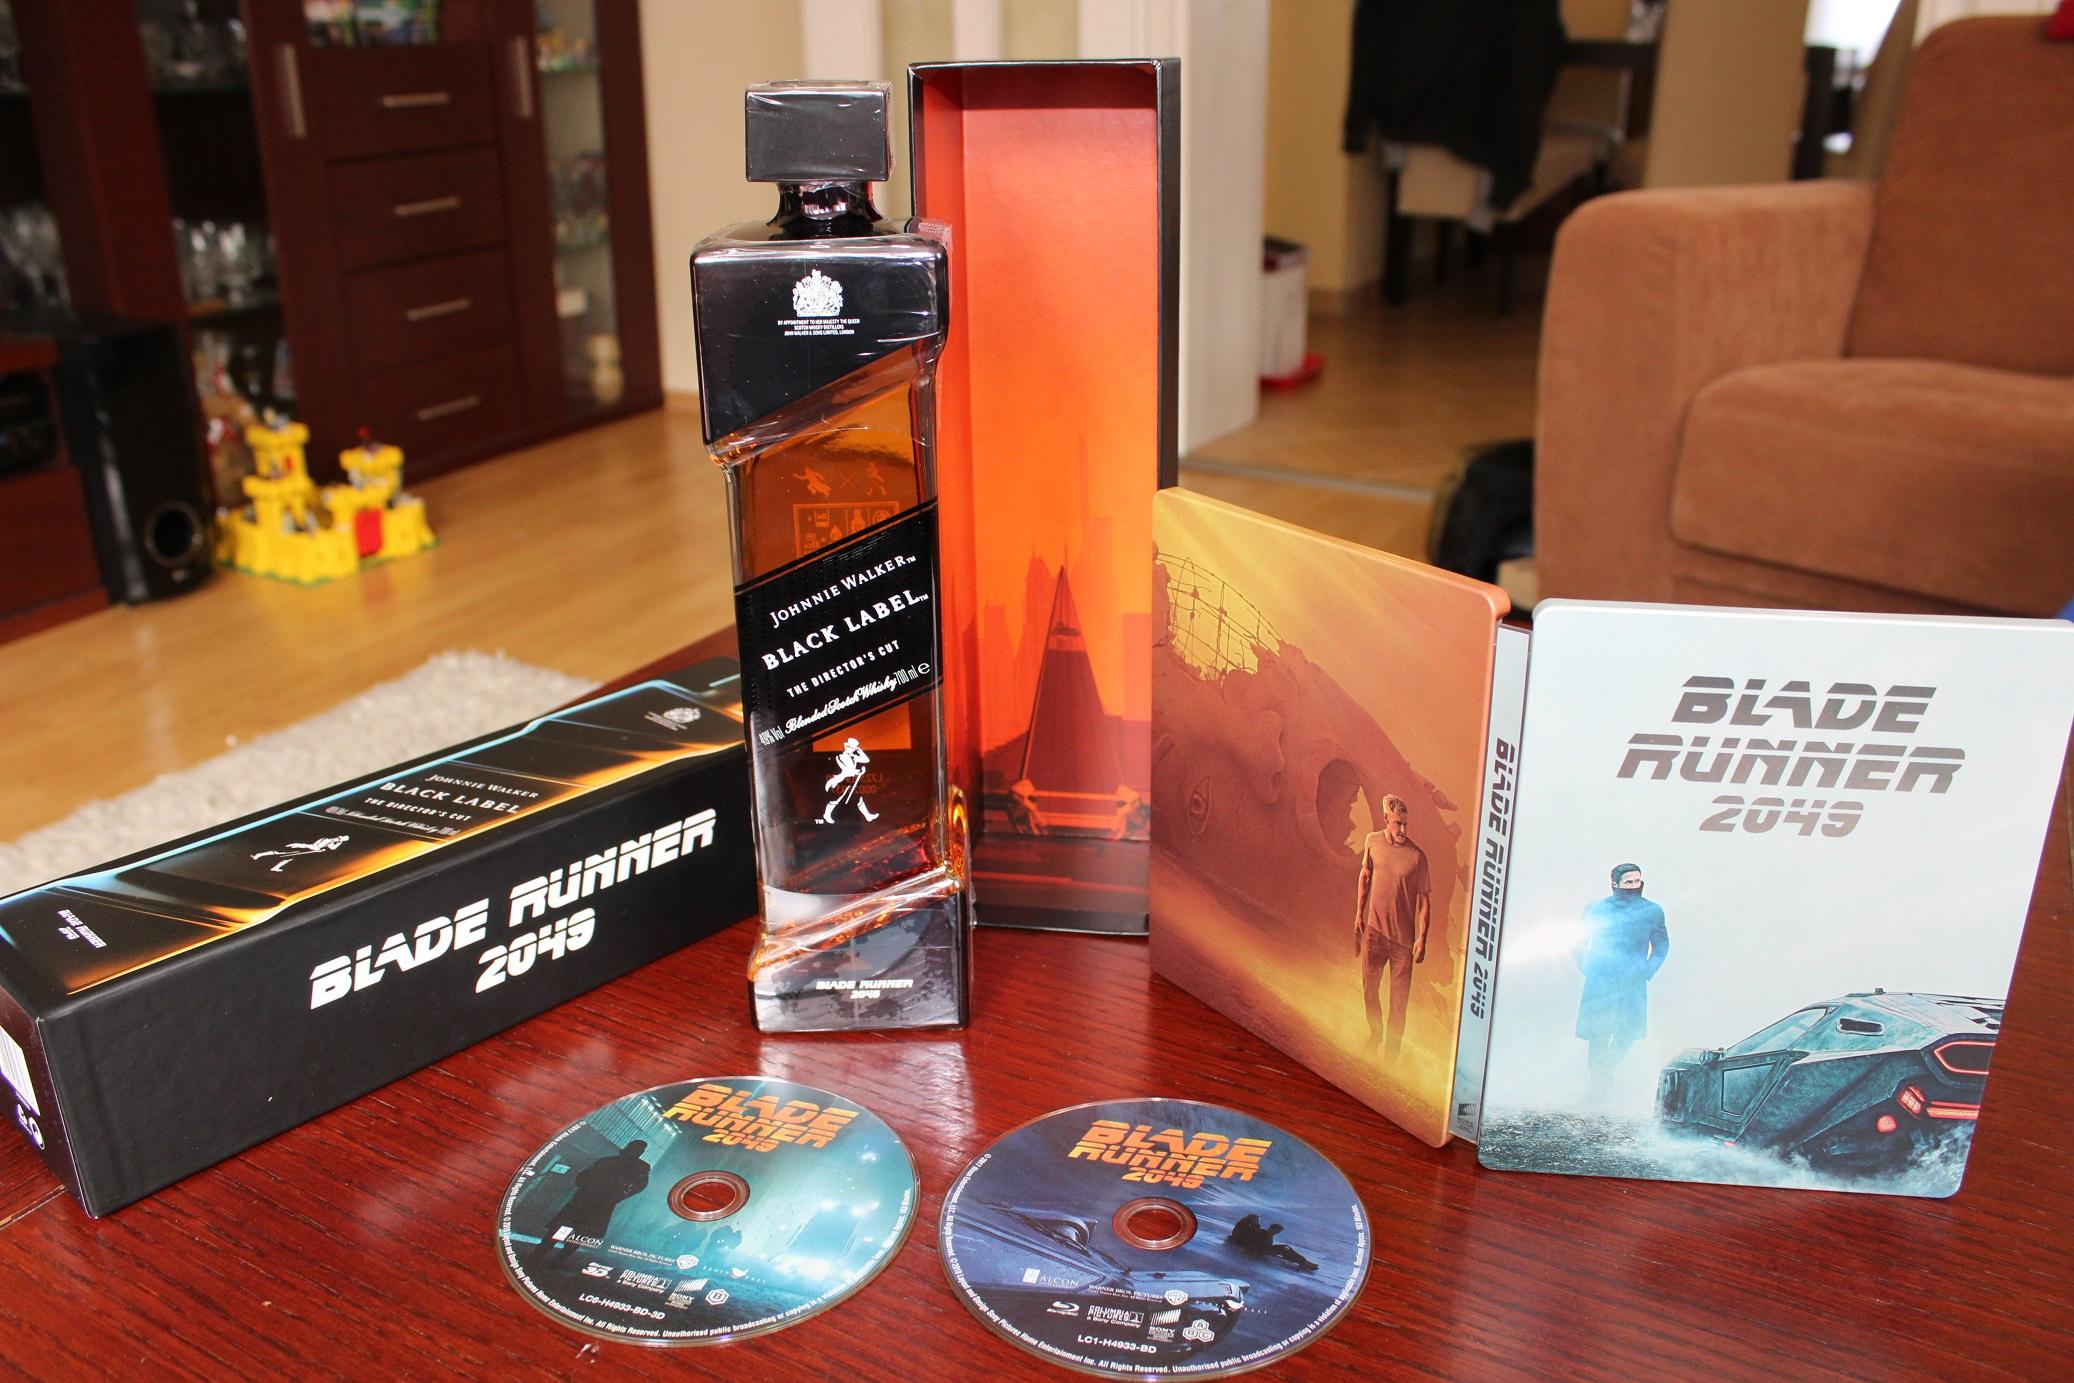 szmk_blade_runner_szarnyas_fejvadasz_2049_bluray_whisky_1.jpg